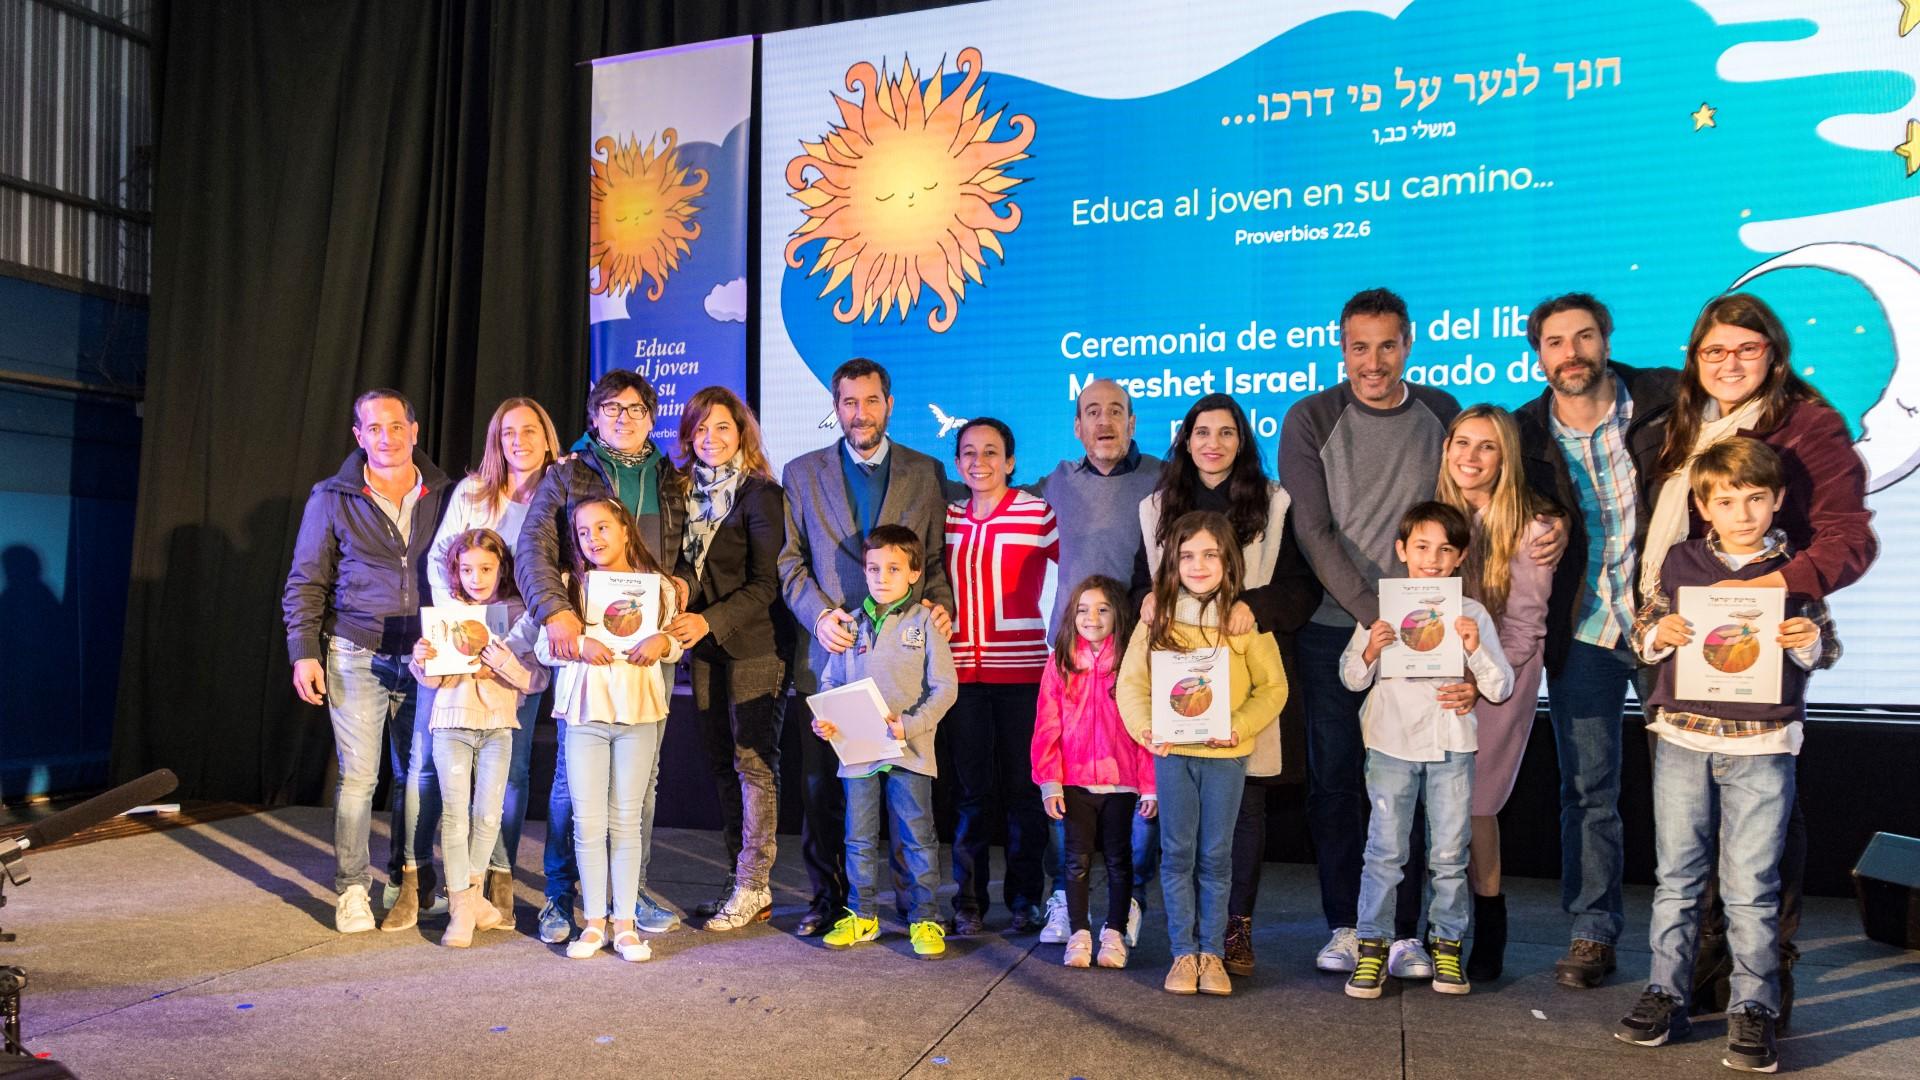 Celebramos la entrega del libro Moreshet Israel